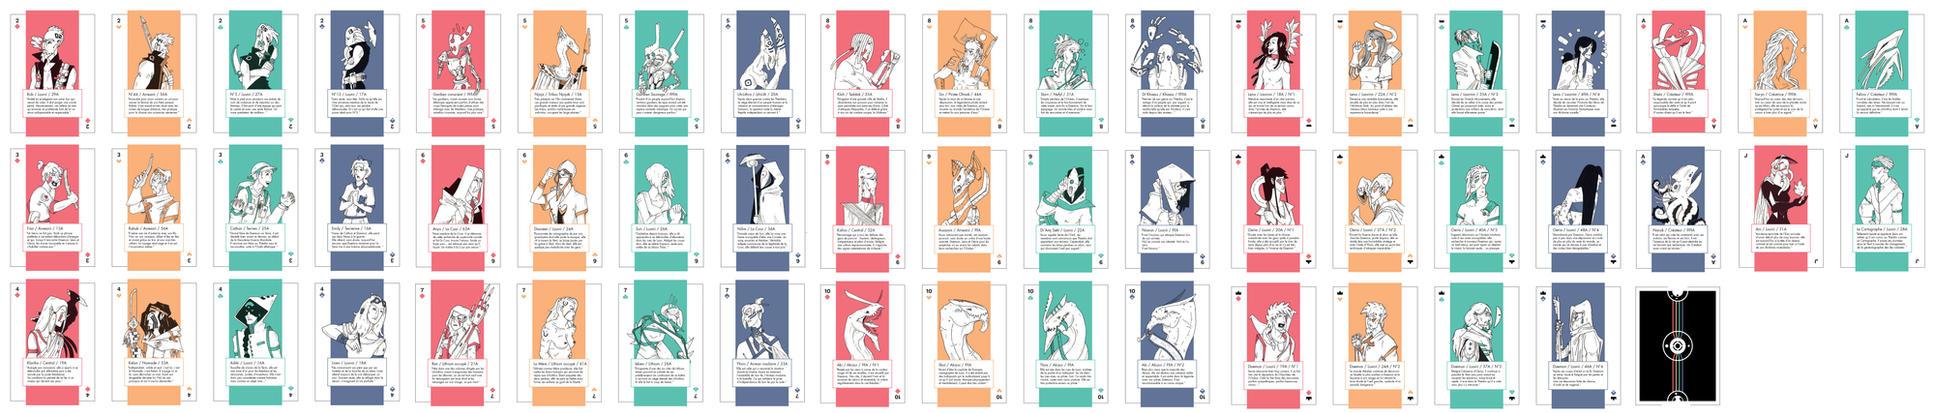 Card Game - Thealian Edition by Daemon-of-Thealia